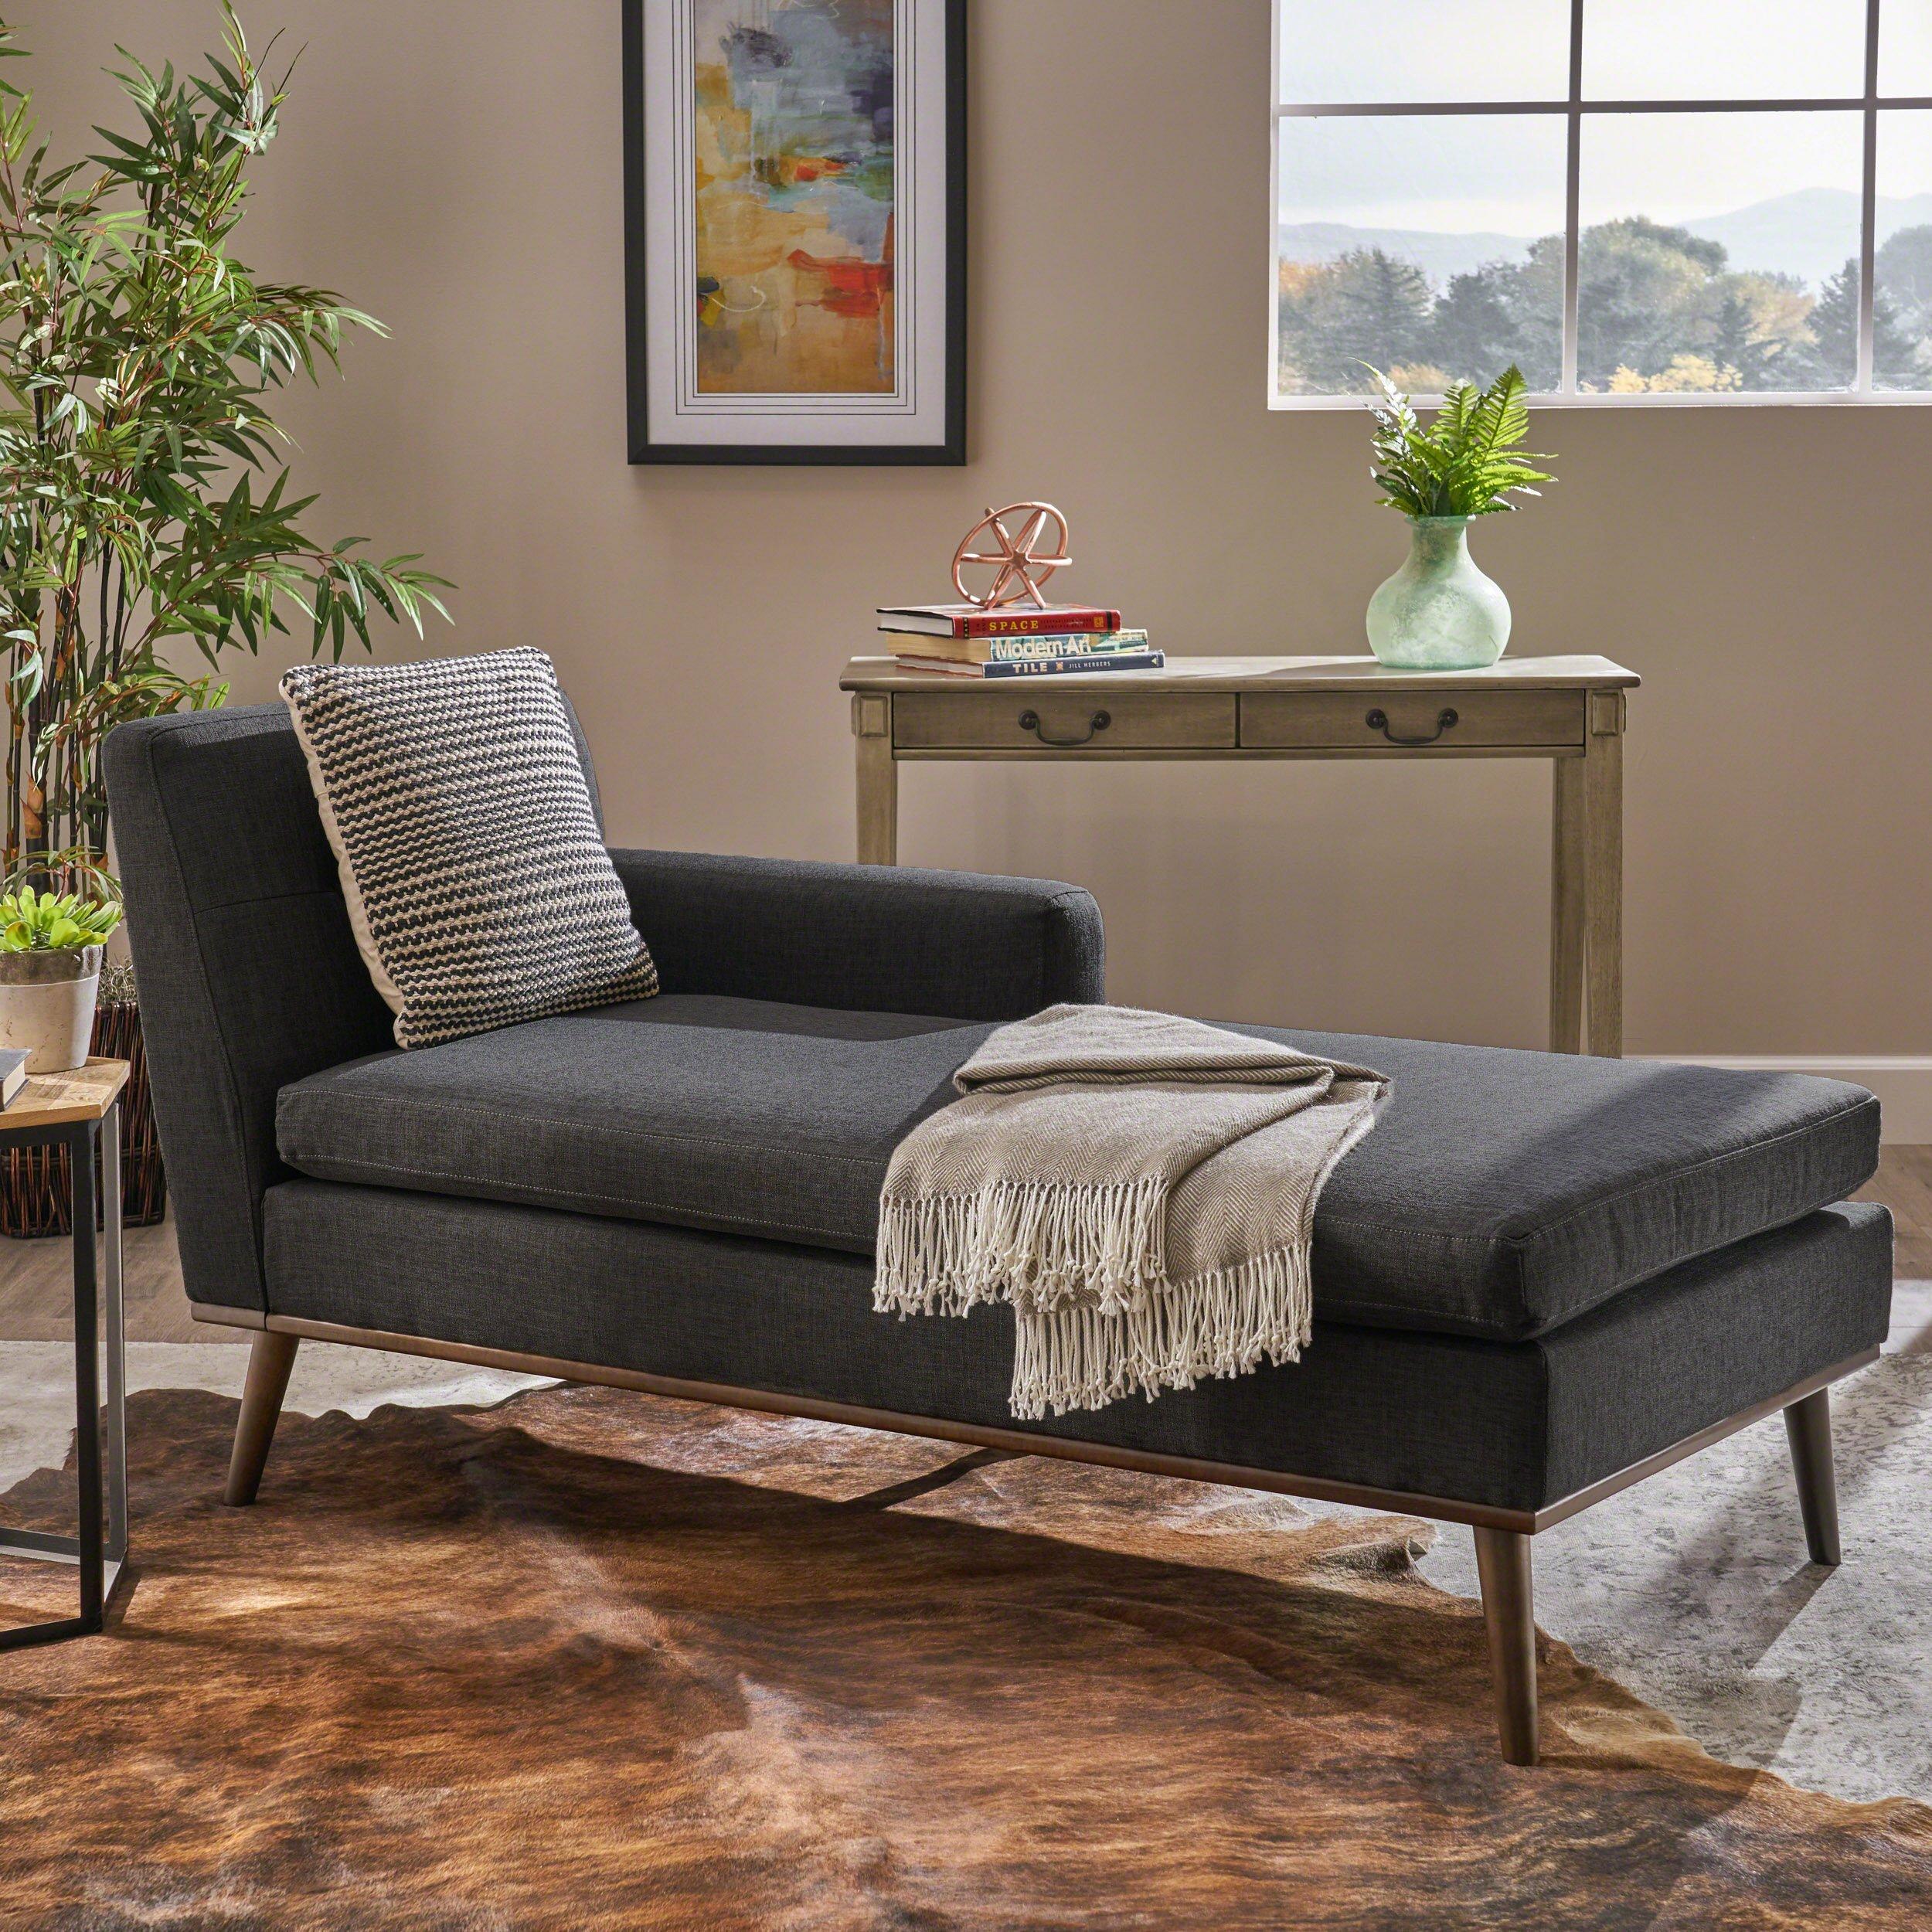 Christopher Knight Home Sophia Mid Century Modern Fabric Chaise Lounge, Muted Dark Grey/Walnut by Christopher Knight Home